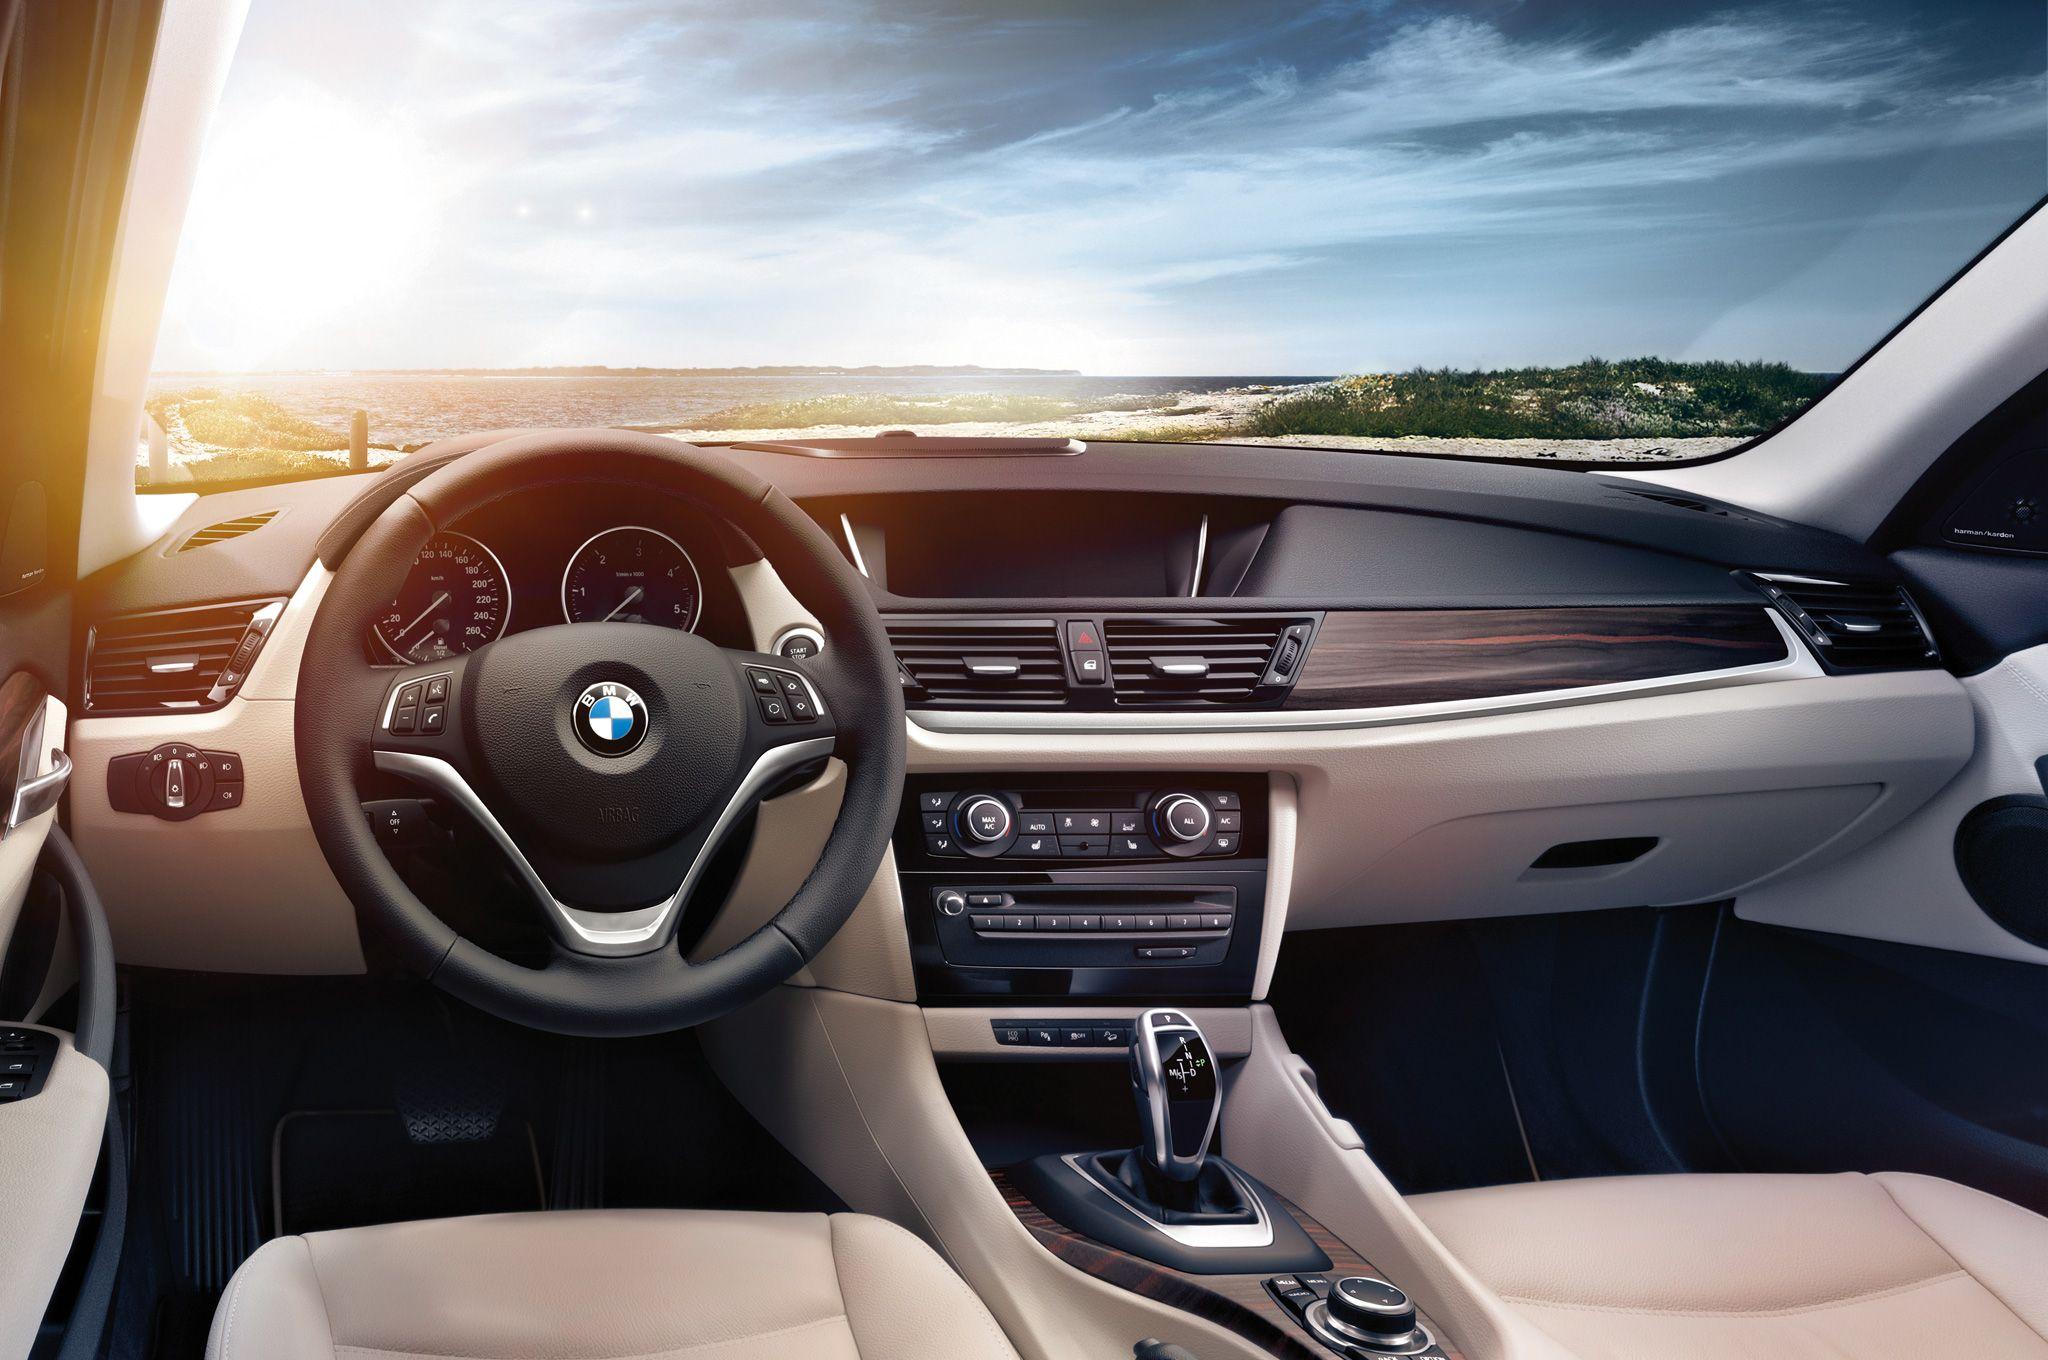 BMW Z Interior Cool Car Httpcarwallspapercombmw - Cool cars inside